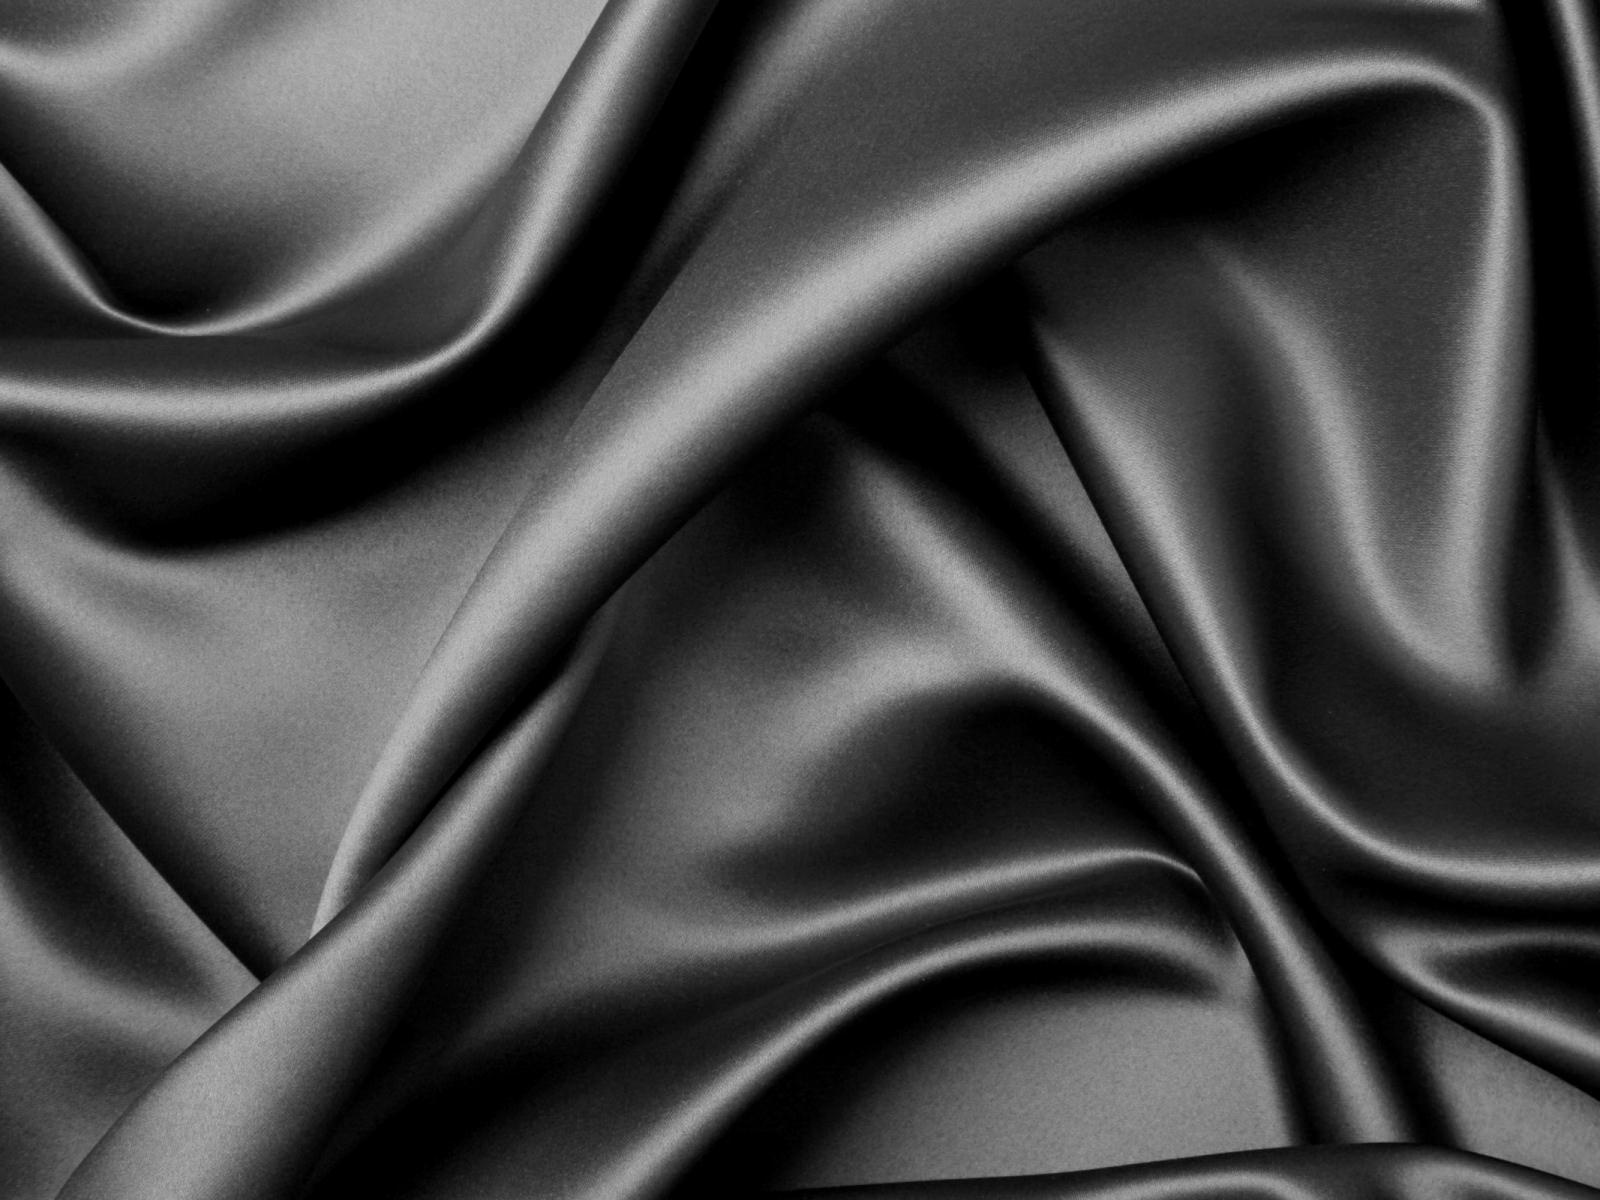 Silk Wavy Dark Material Fabric Texture